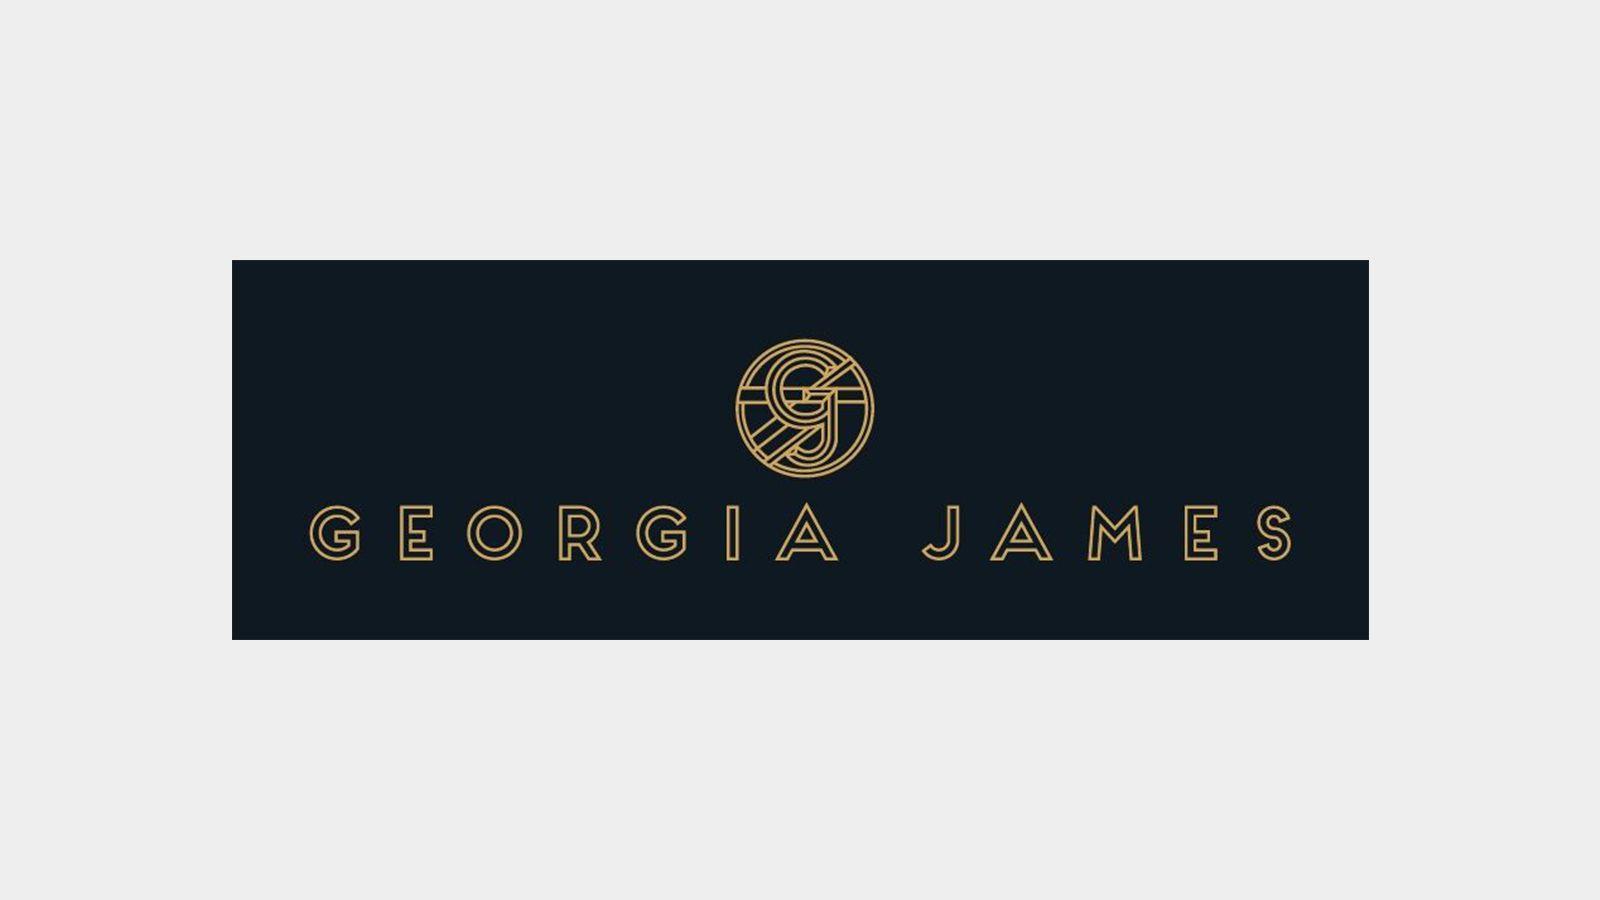 Georgia James